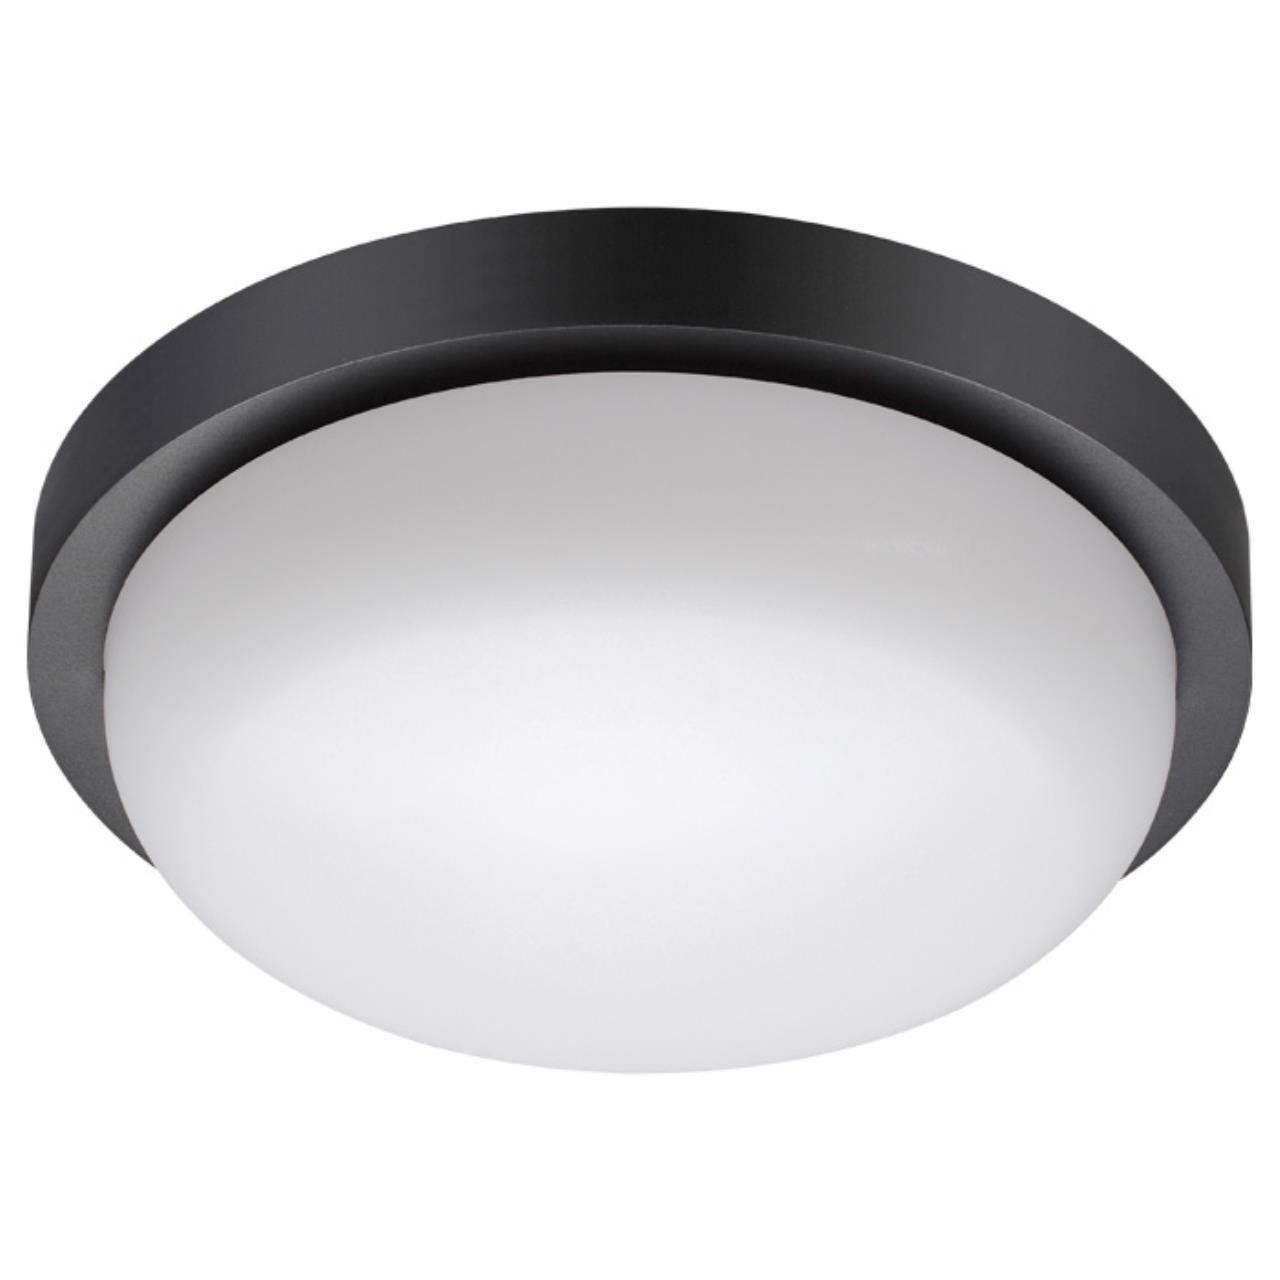 358017 STREET NT19 173 черный Ландшафтный светильник IP65 LED 4000К 18W 220V OPAL